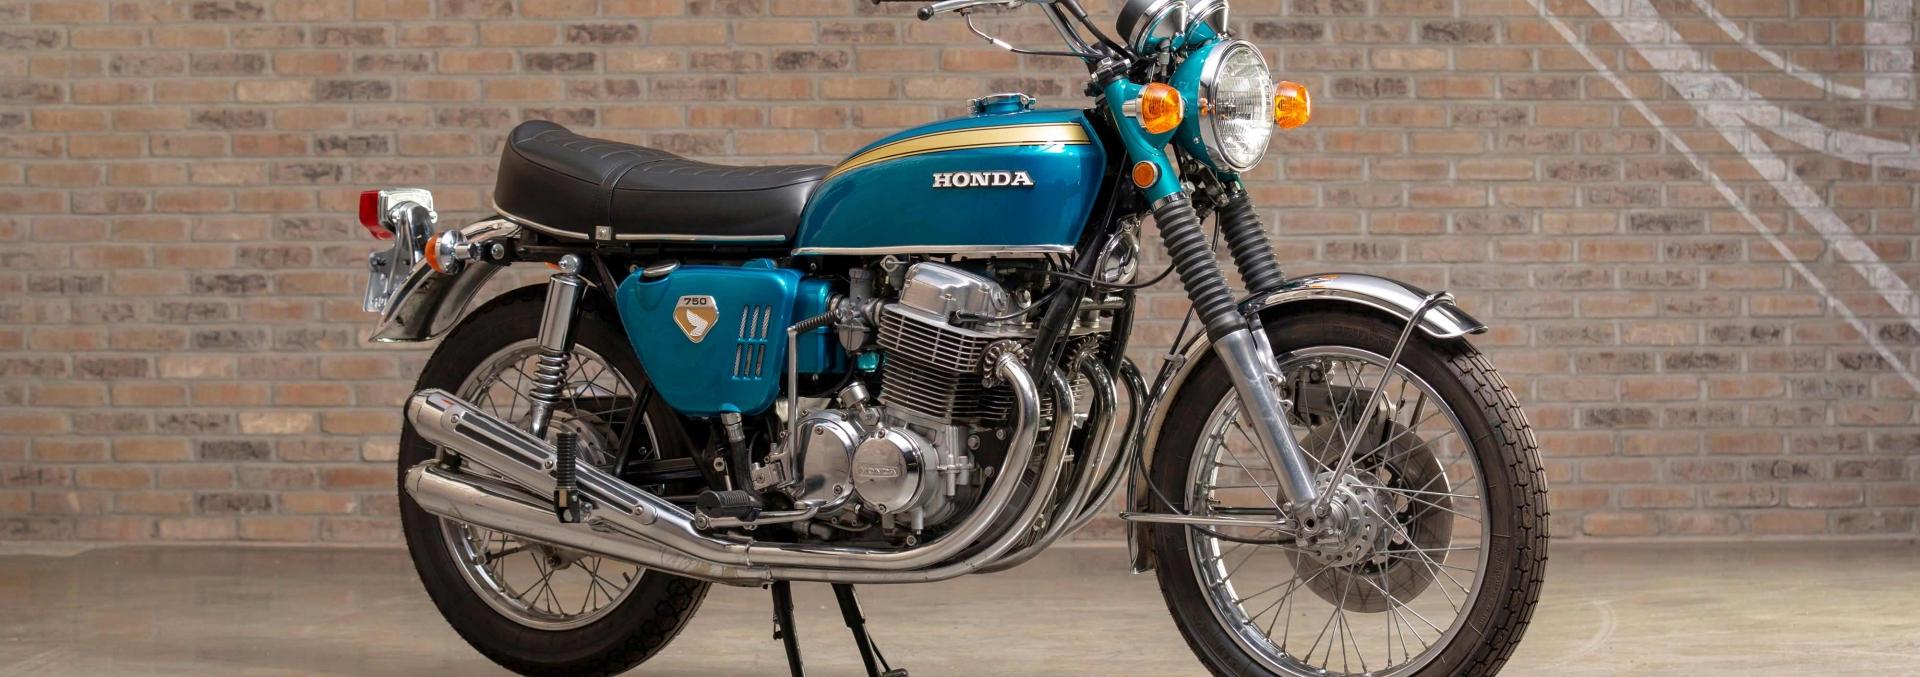 Honda CB 750 at Throttlestop's Motorcycle Museum